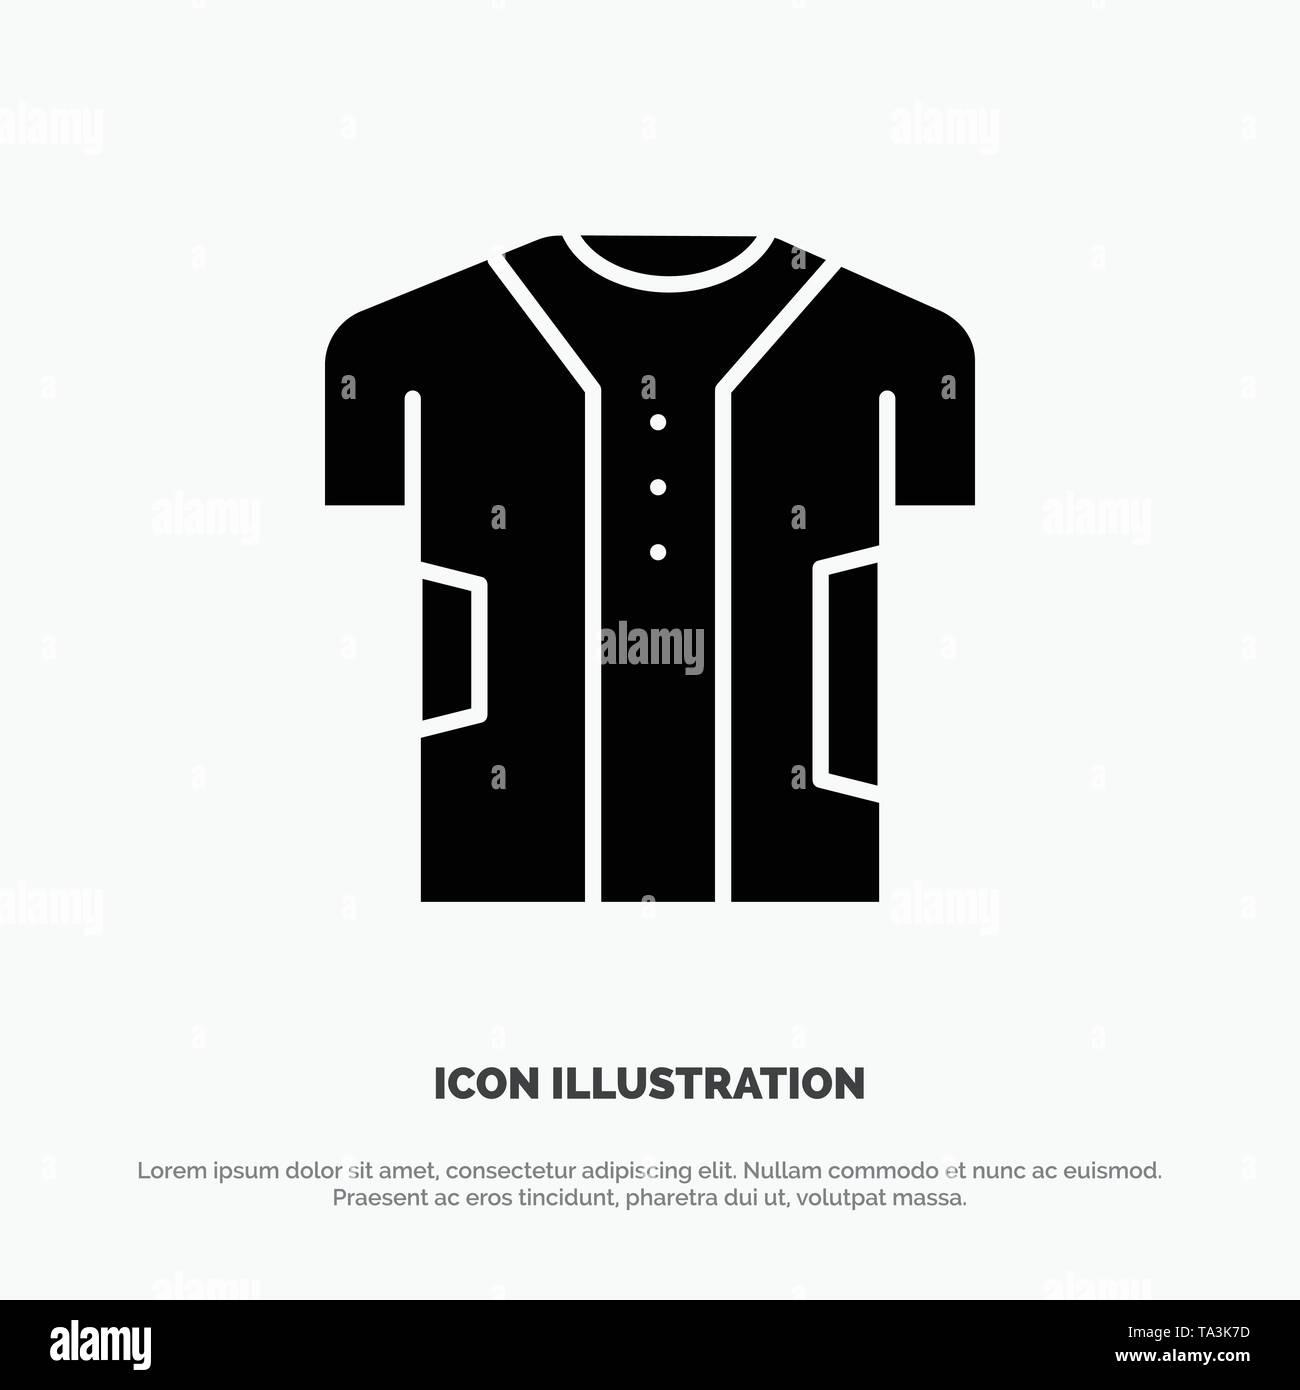 Tuch, Kleidung, digitale, elektronische, Stoff solide Glyphe Symbol Vektor Stockbild